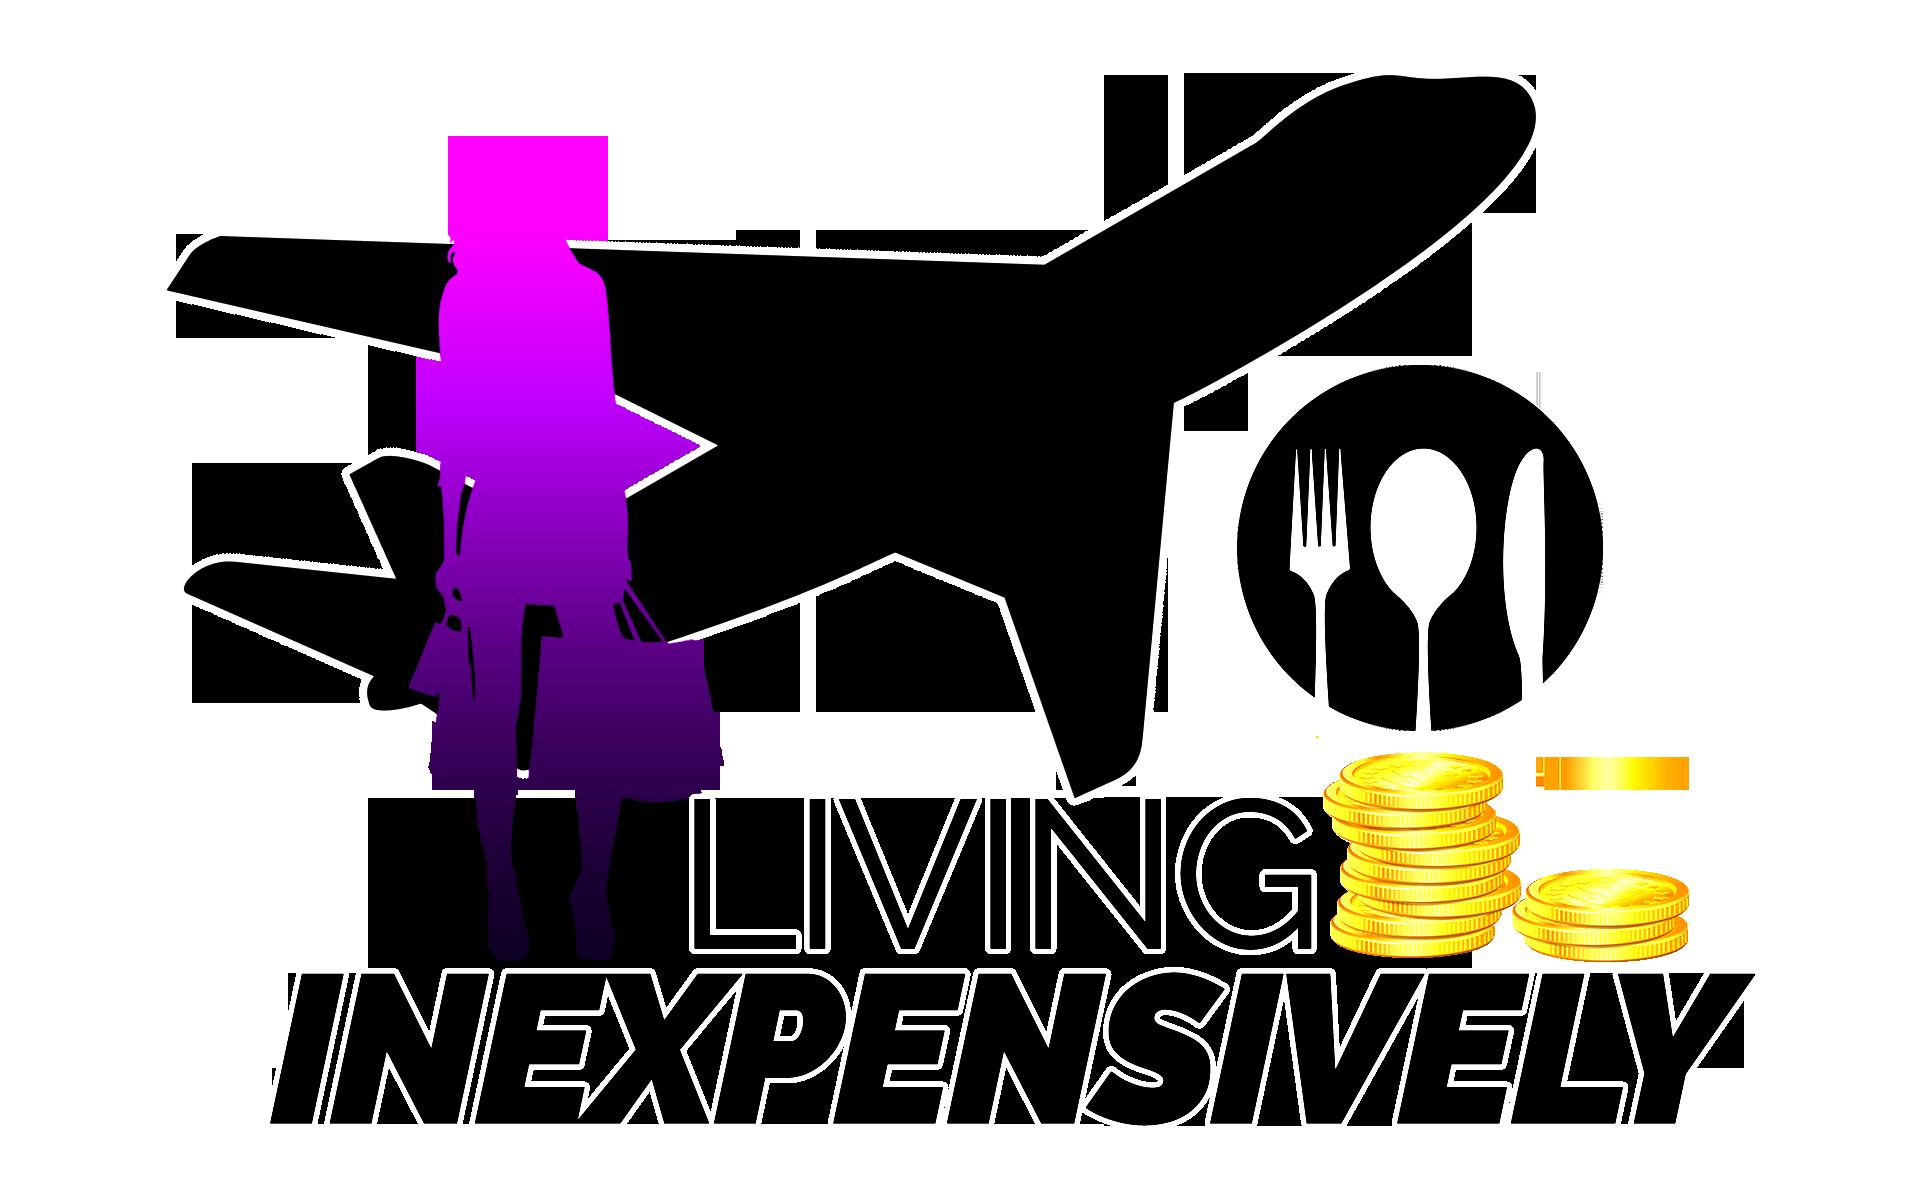 Living inexpensively logo